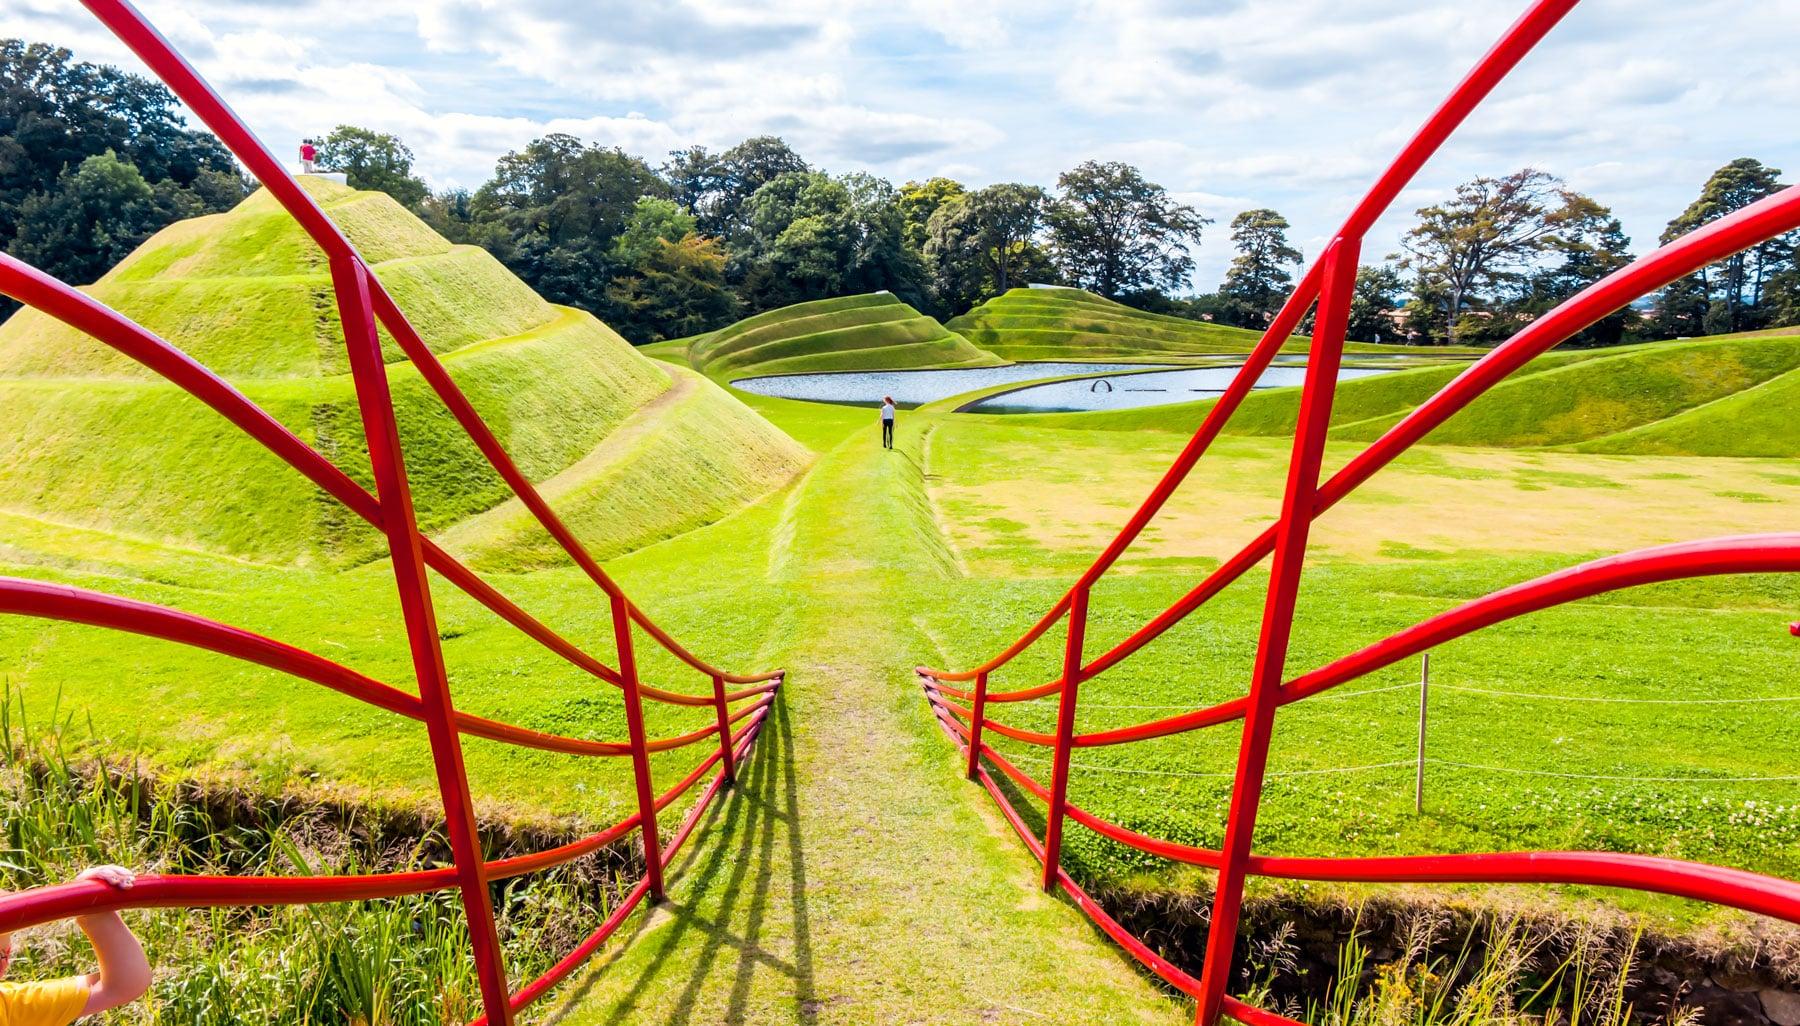 Festival de Arte de Edimburgo